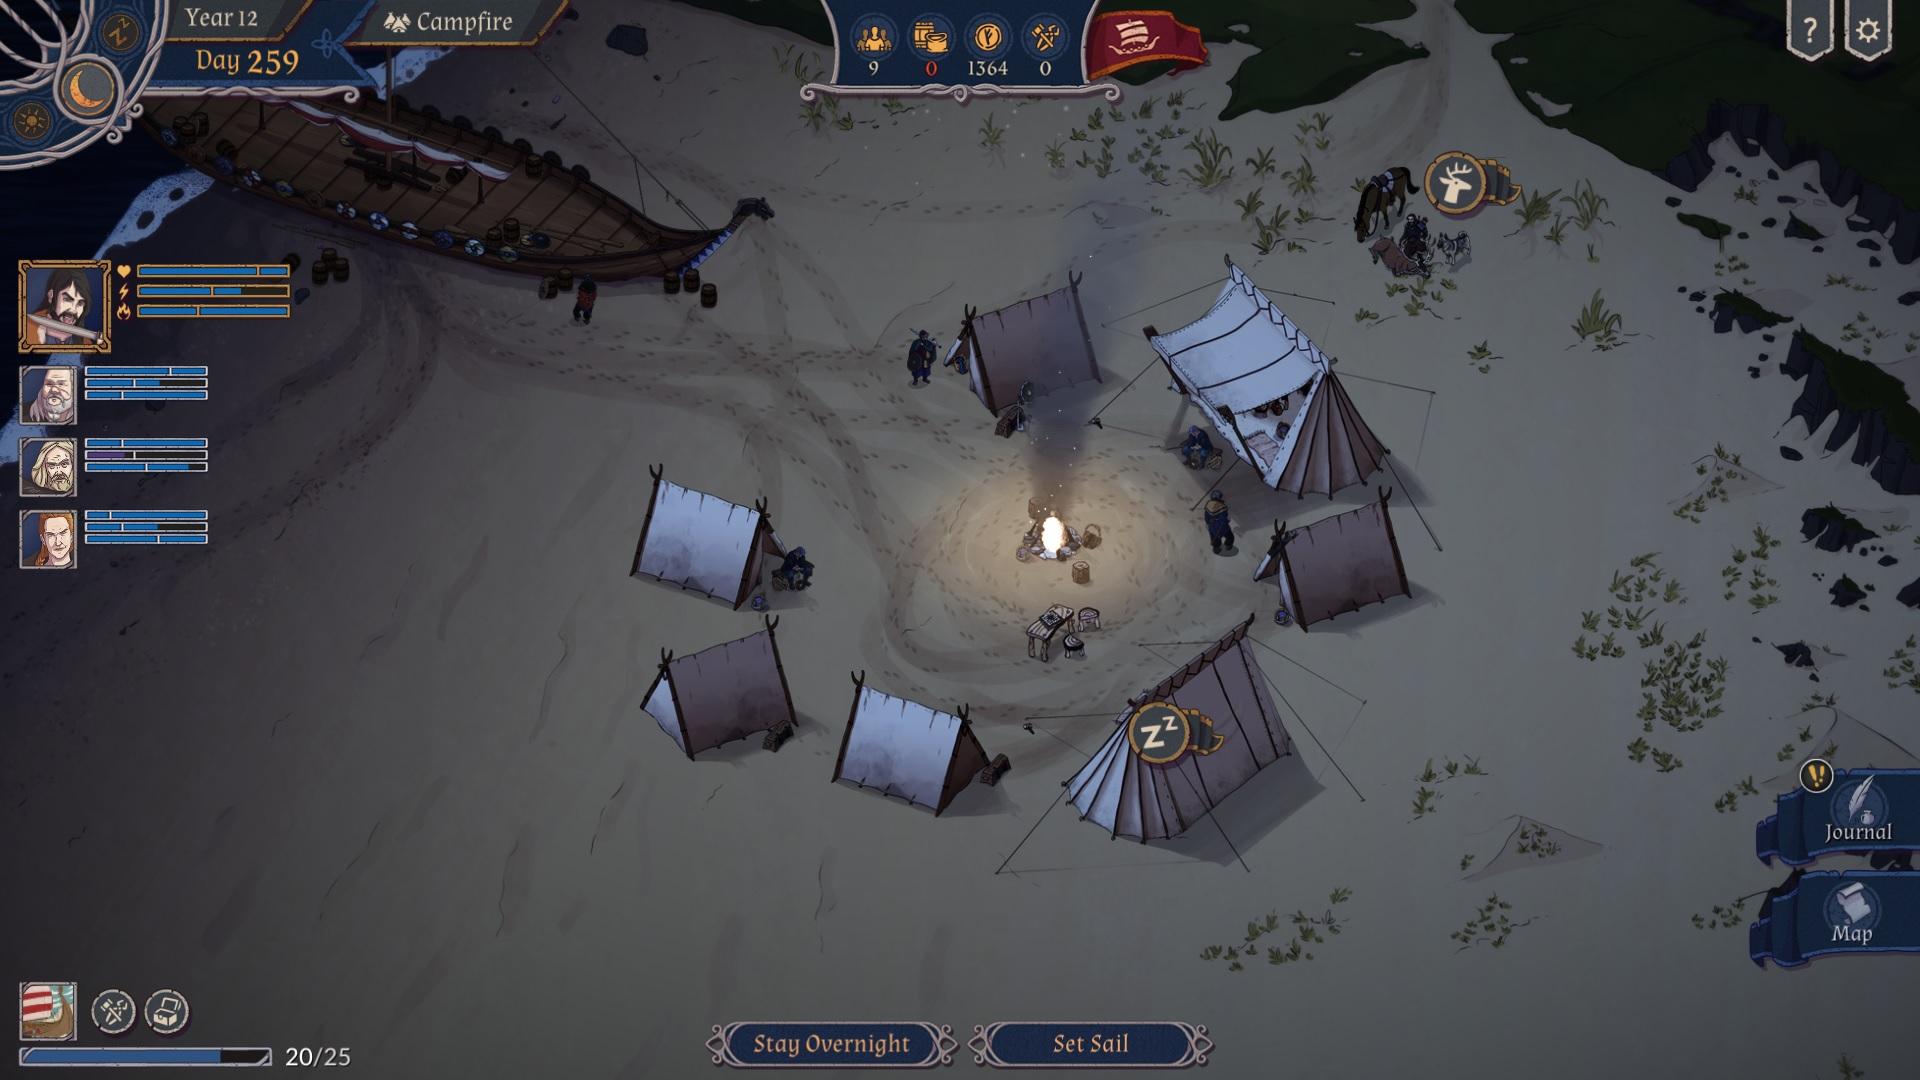 The Great Whale Road Screenshot 2